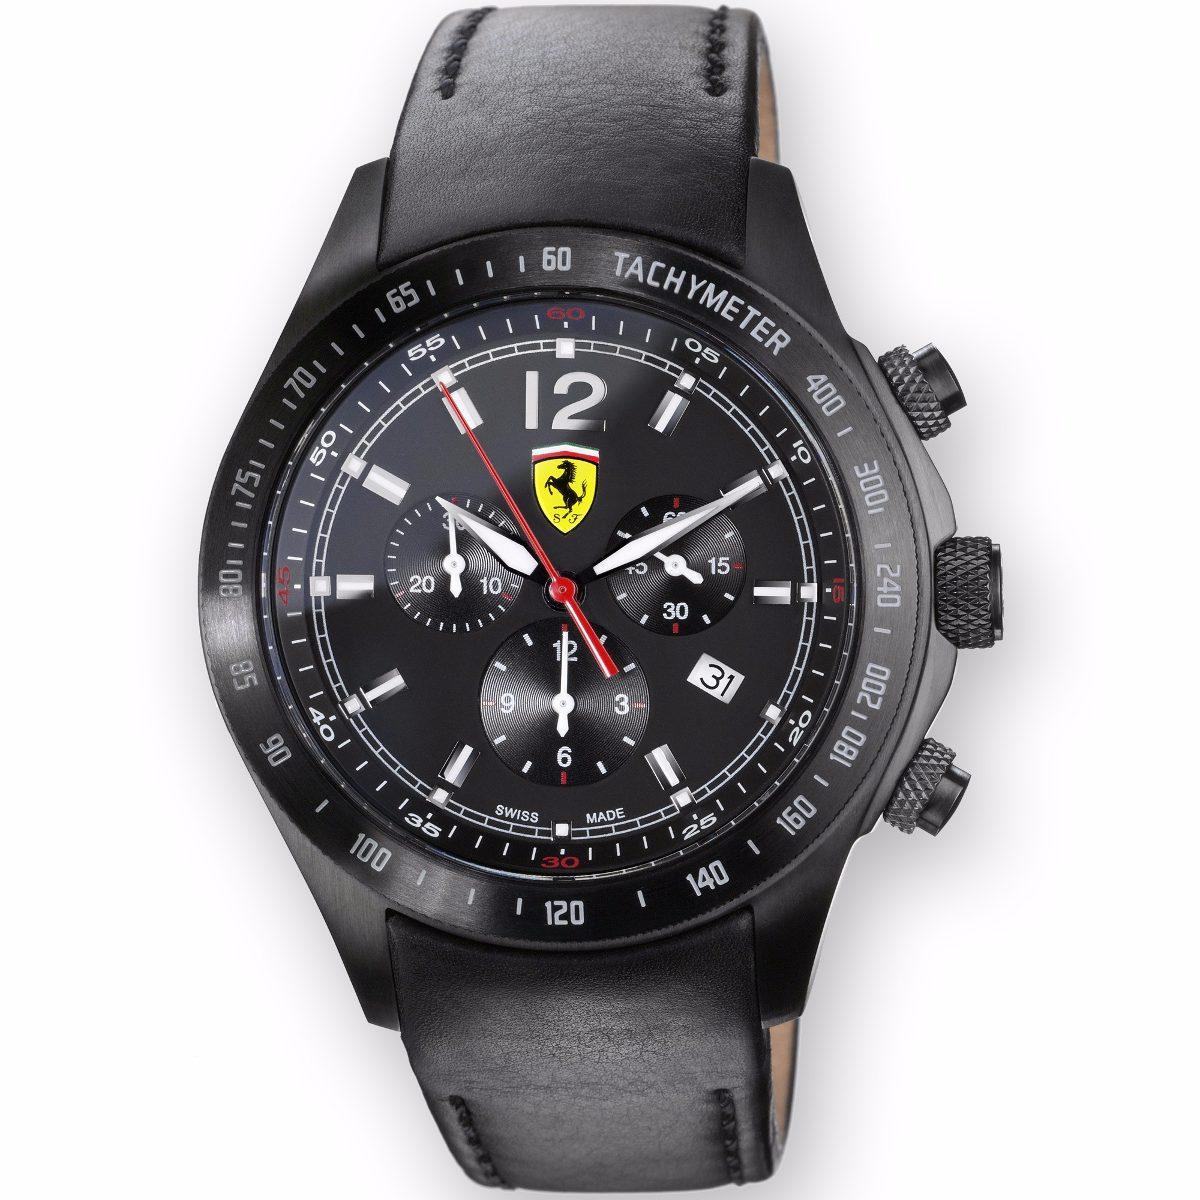 7baa9da62ac relógio ferrari scuderia chronograph 270027171. Carregando zoom.